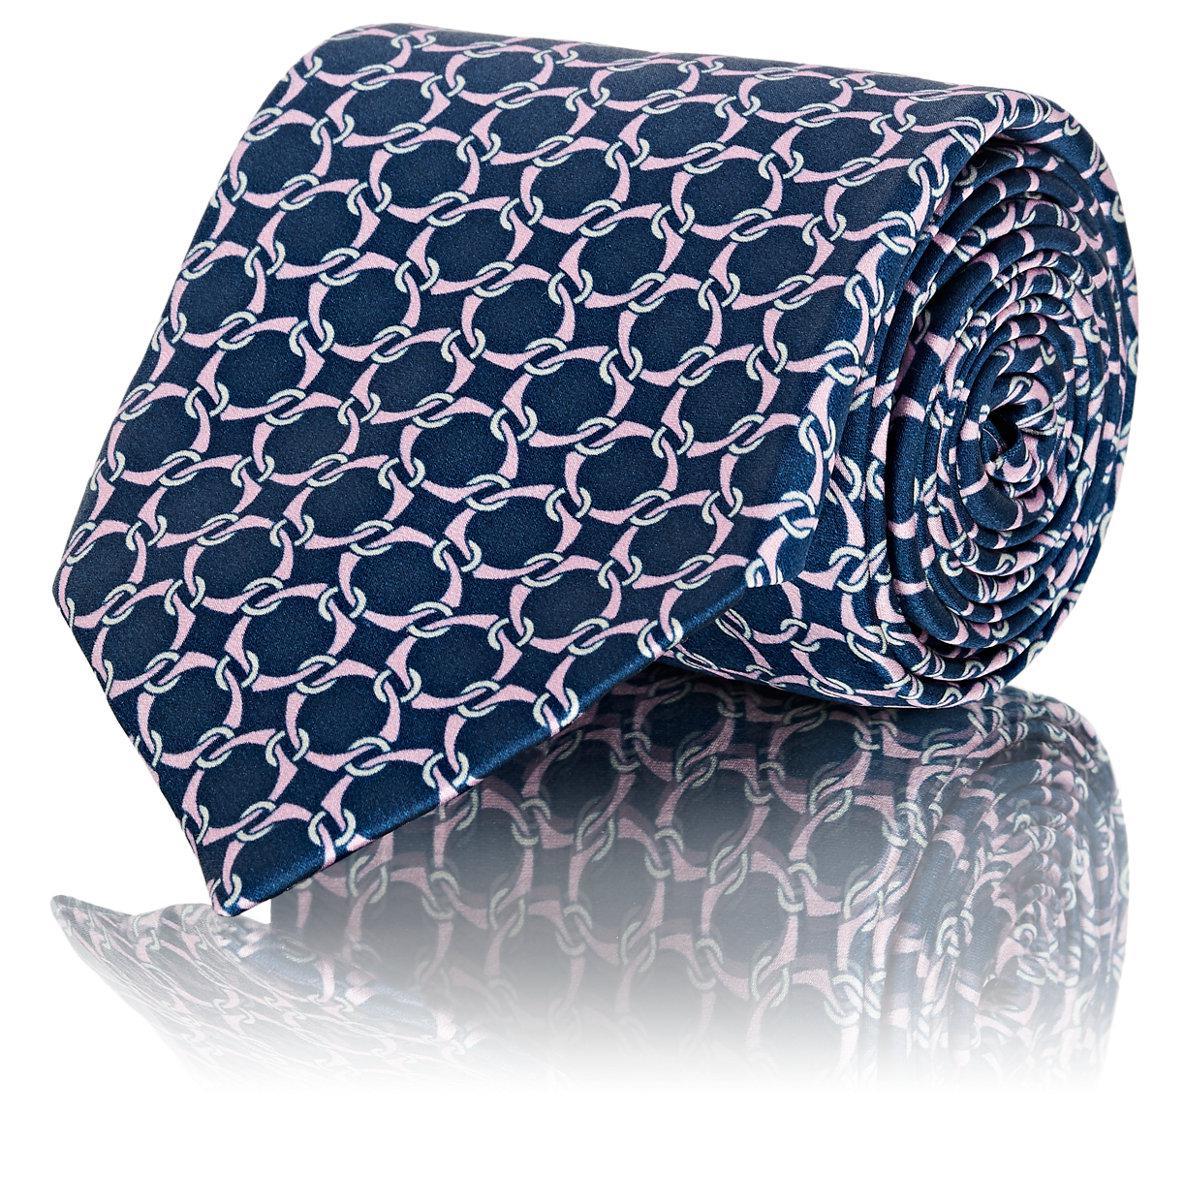 Mens Interlocking-Ring-Print Silk Necktie Barneys New York BEcK6